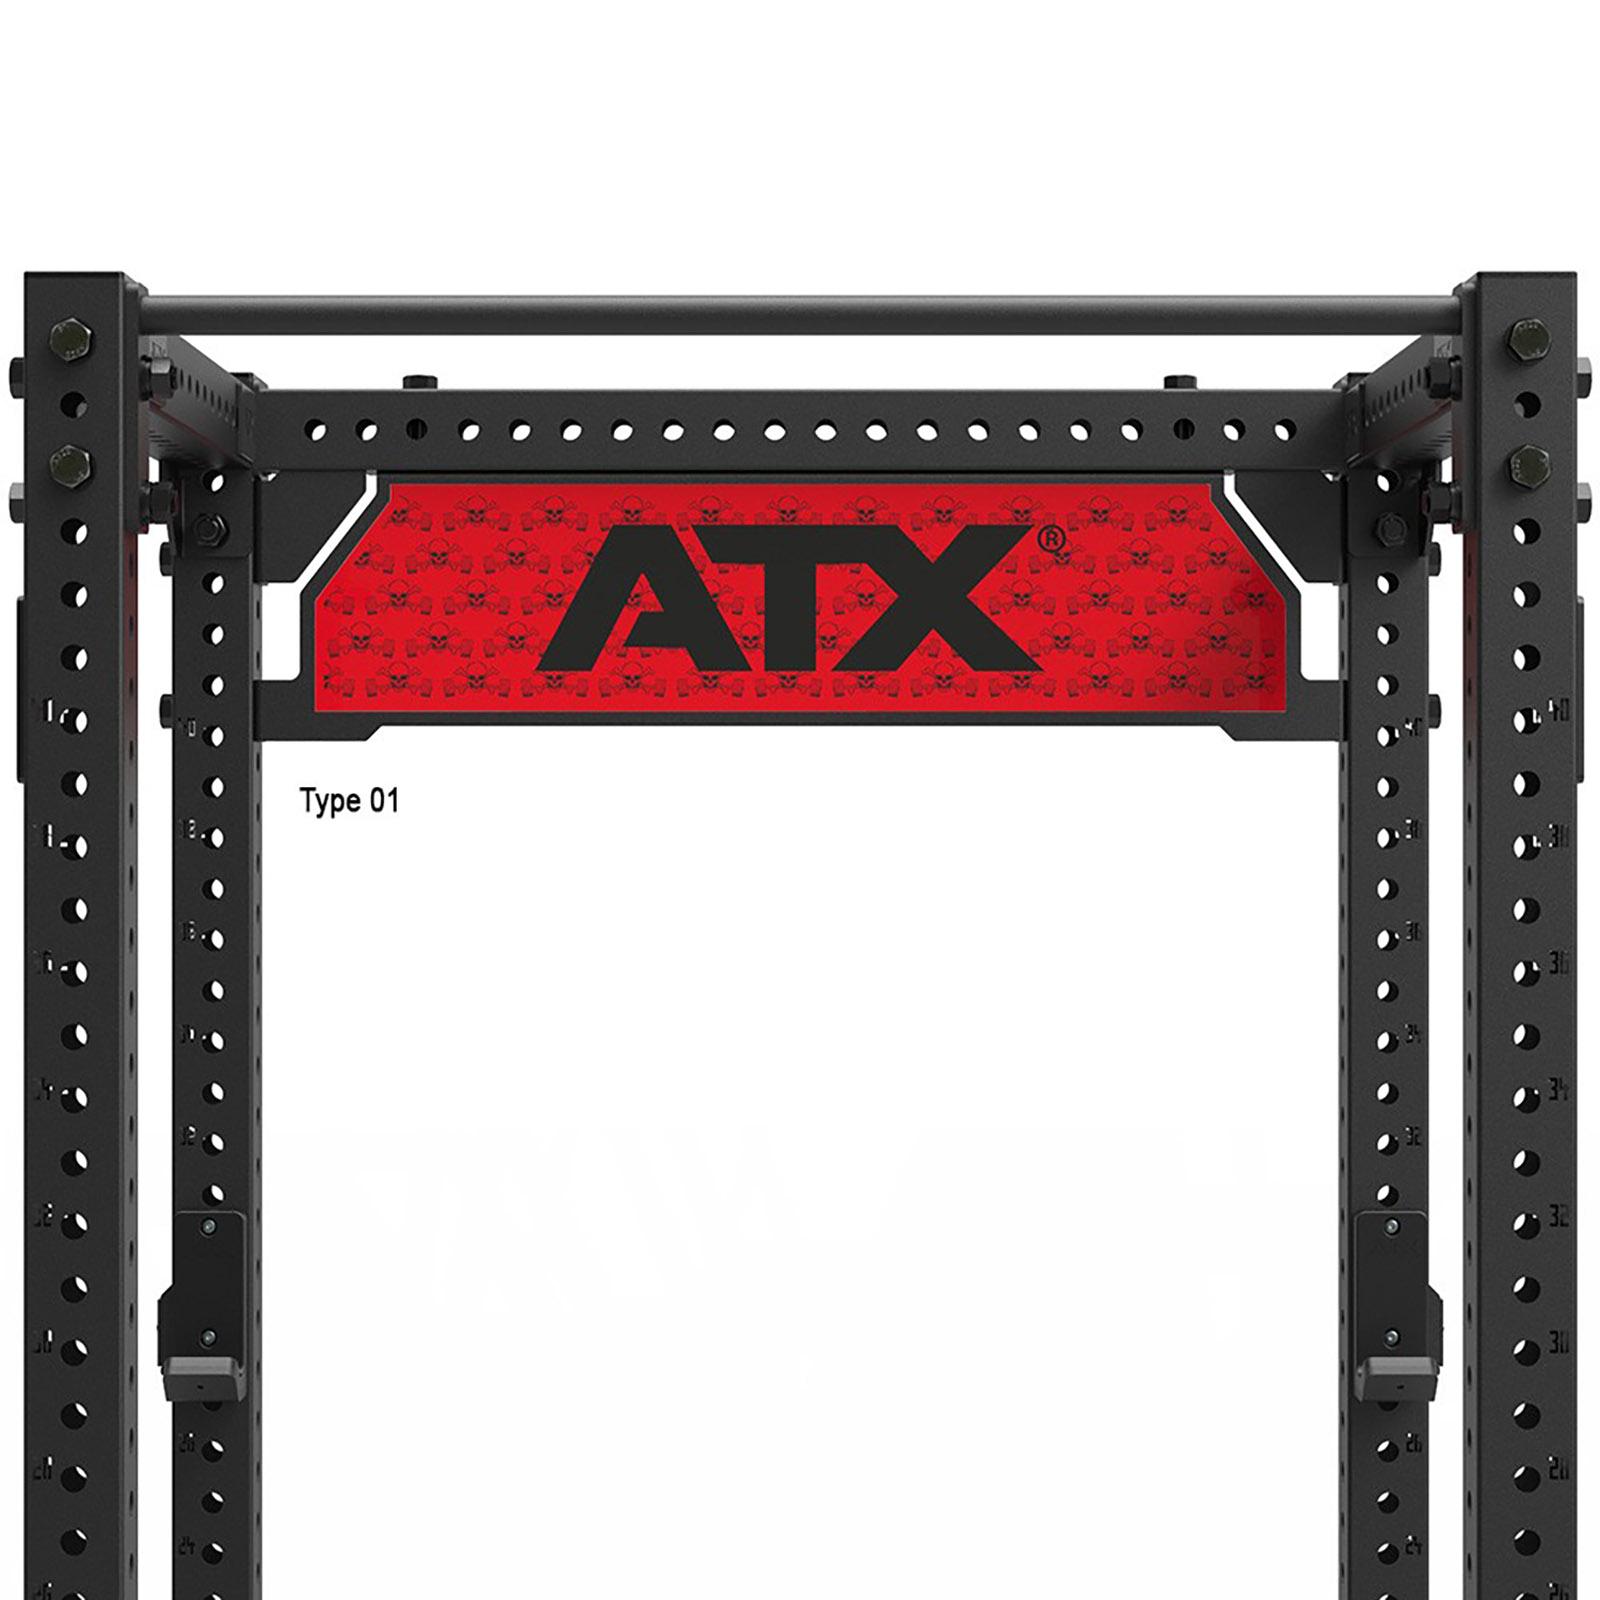 atx power rack logo plate